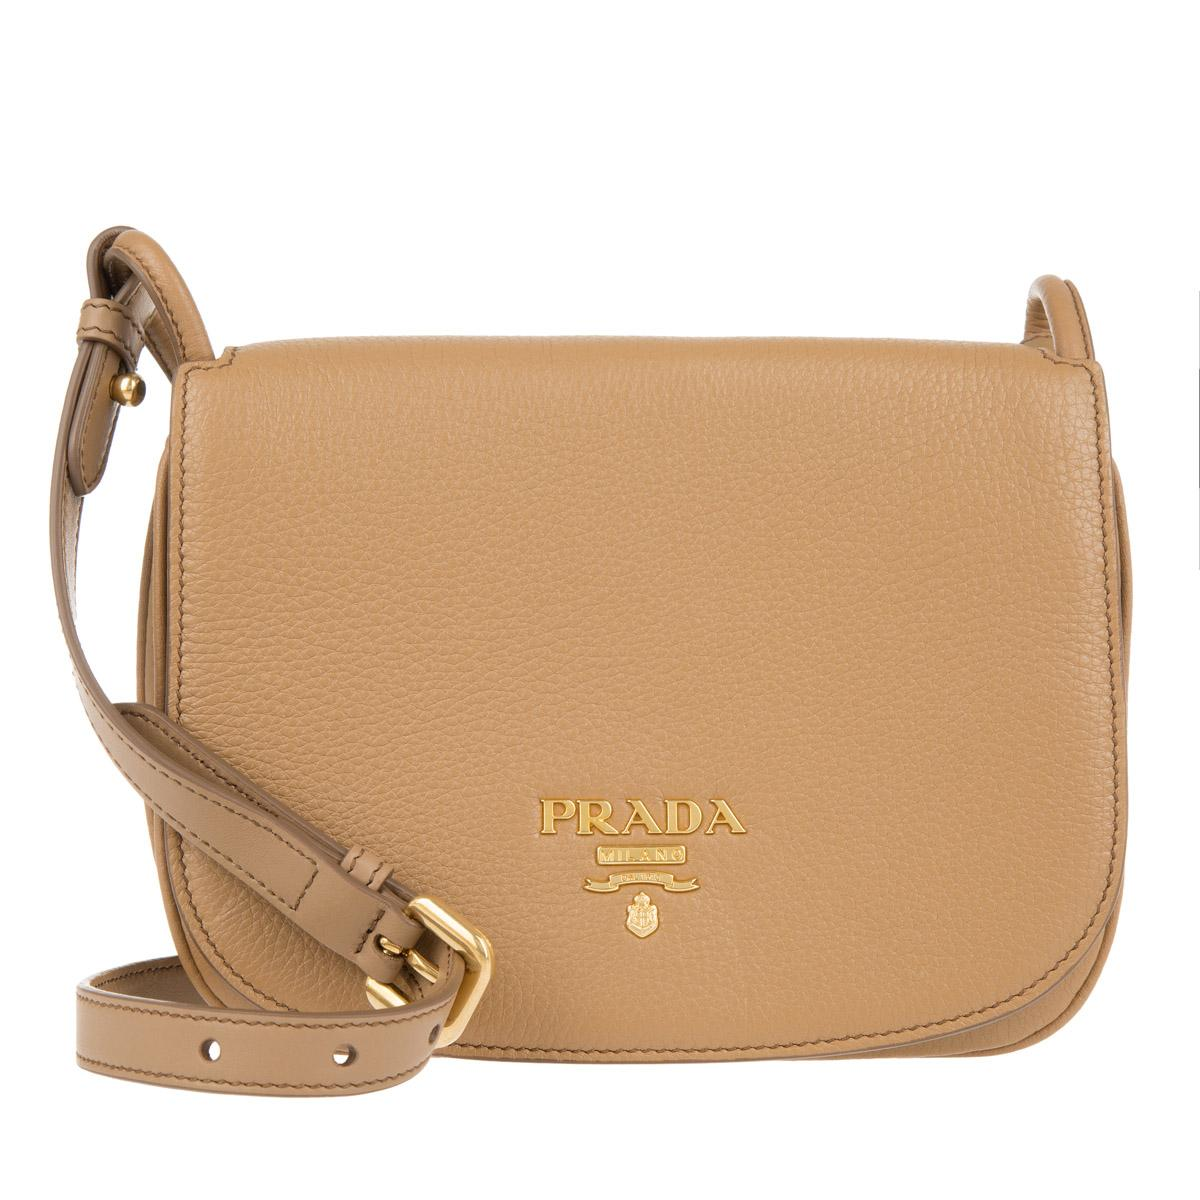 Cross Body Bags - Pionniere Bag Nylon Caramel - brown - Cross Body Bags for ladies Prada ahv4BIu